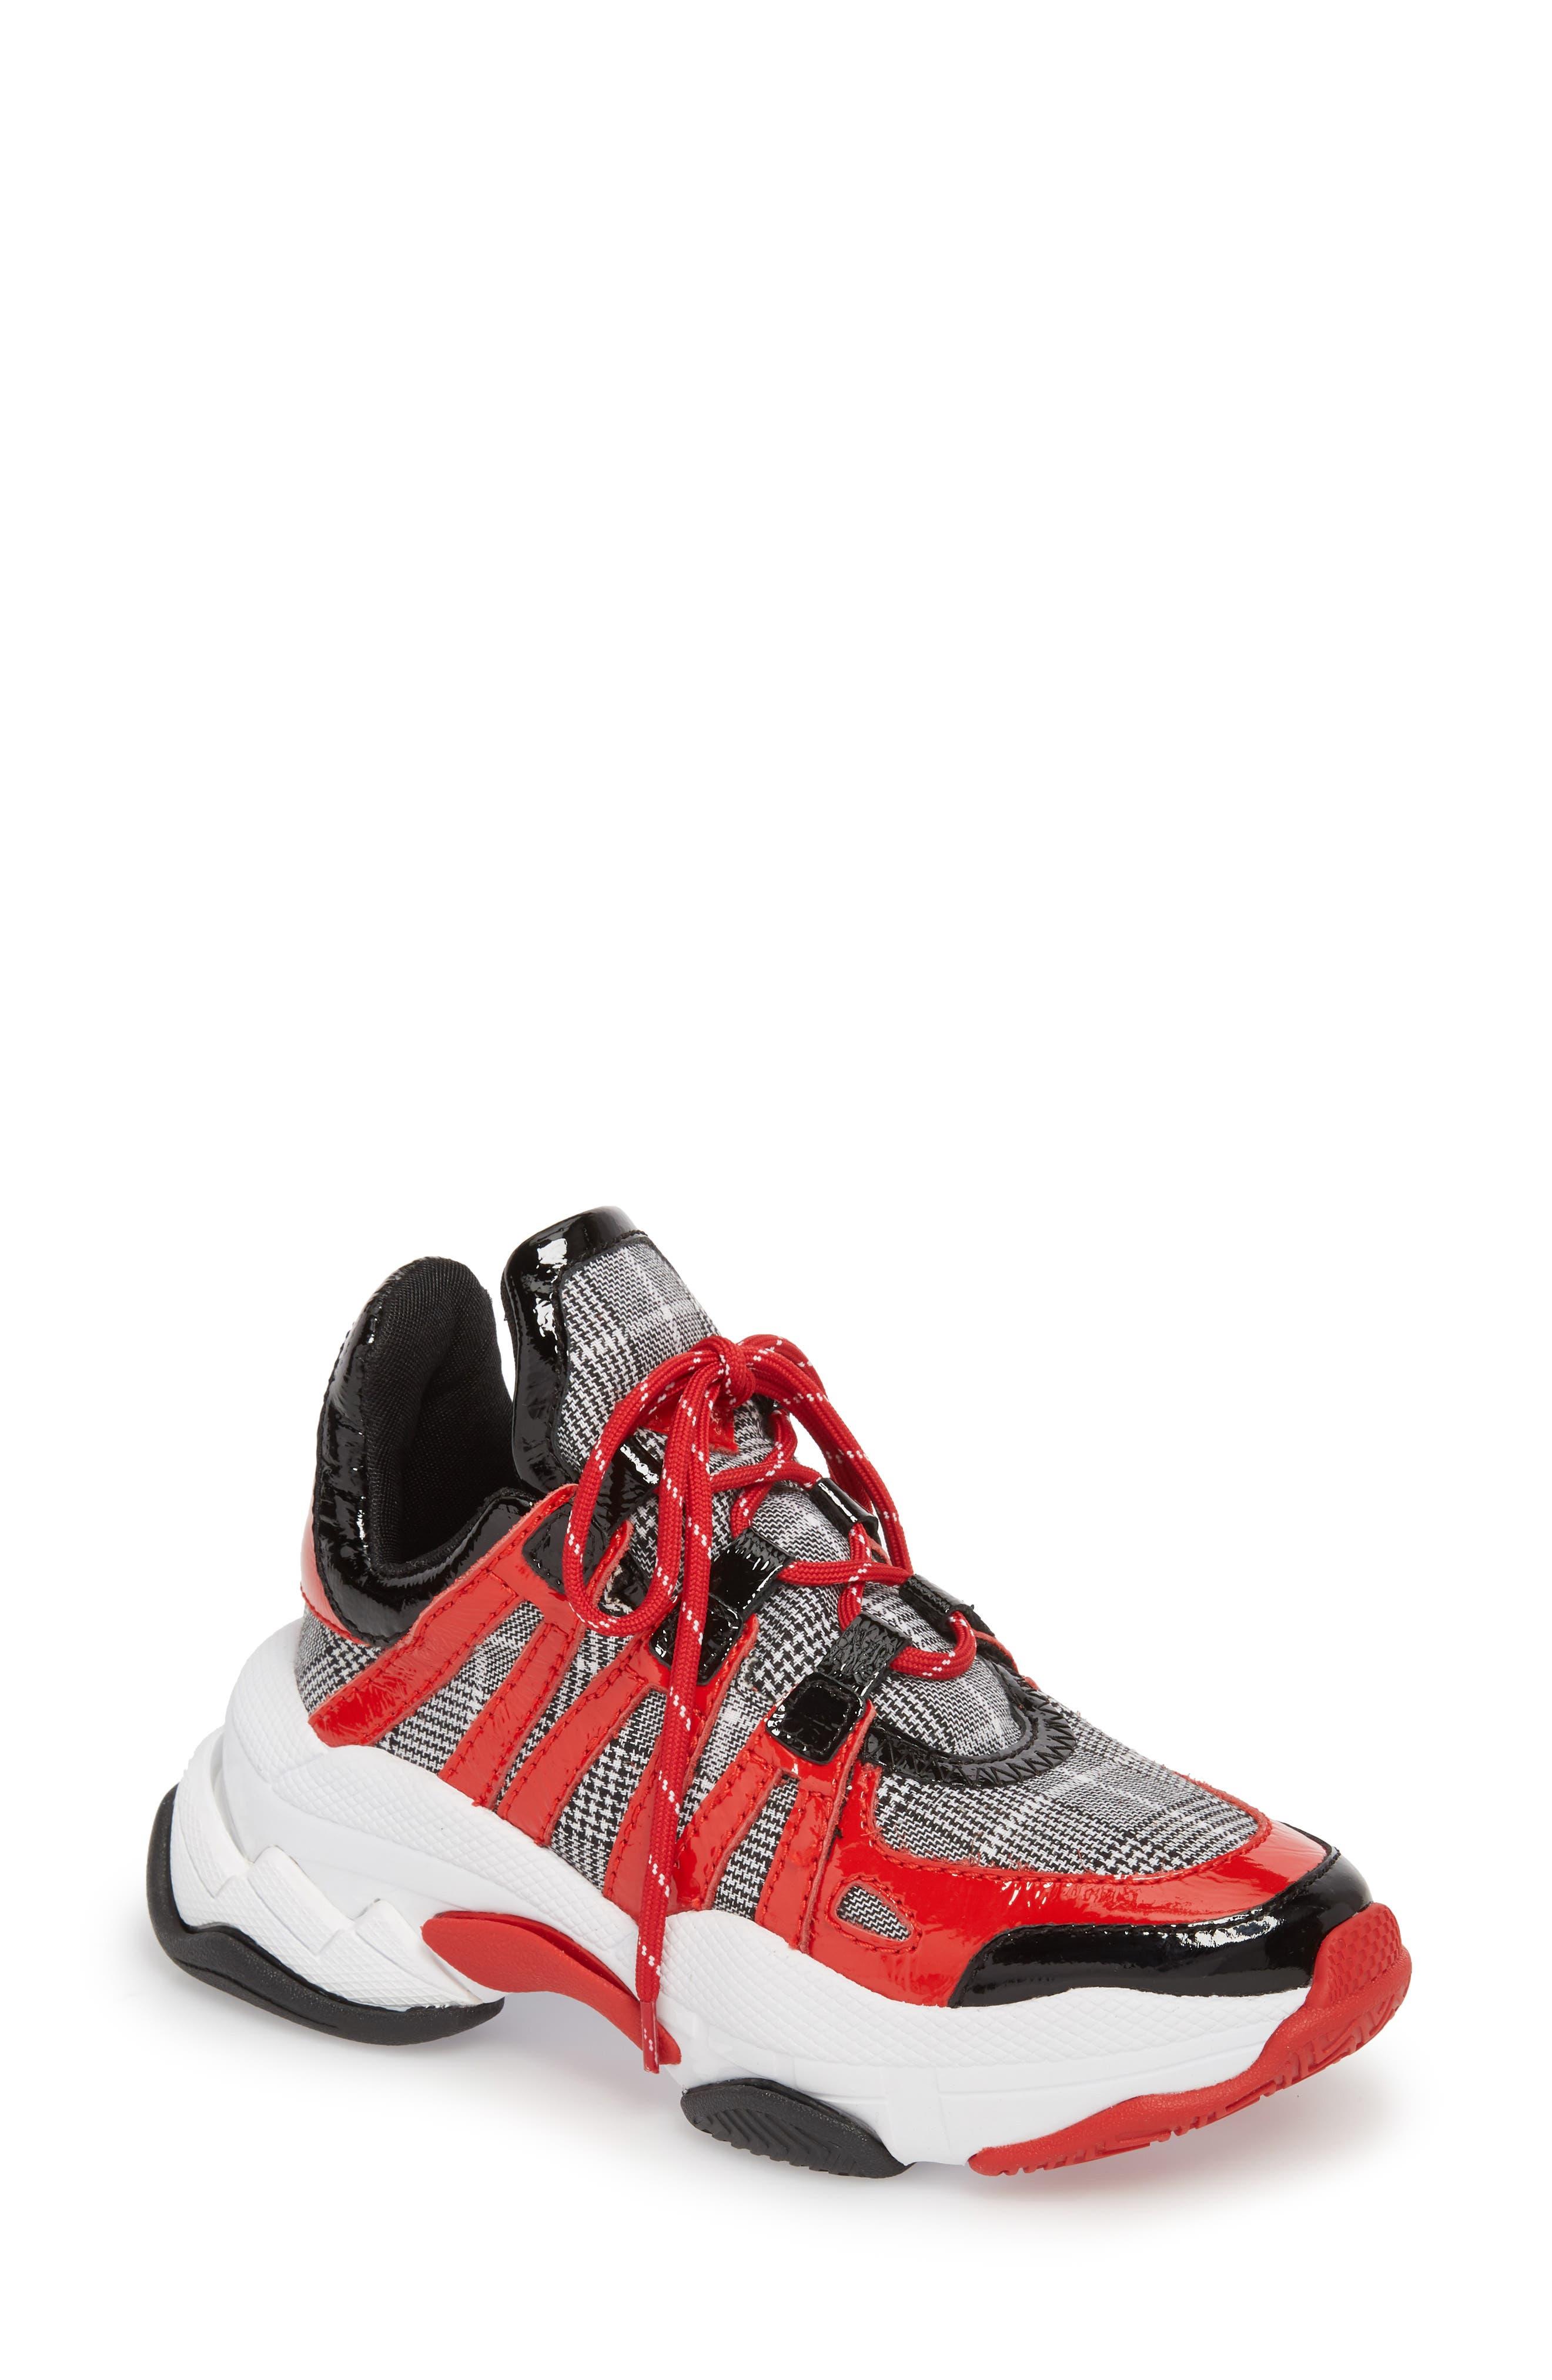 WiFi Sneaker,                             Main thumbnail 1, color,                             Red Pat Plaid Multi